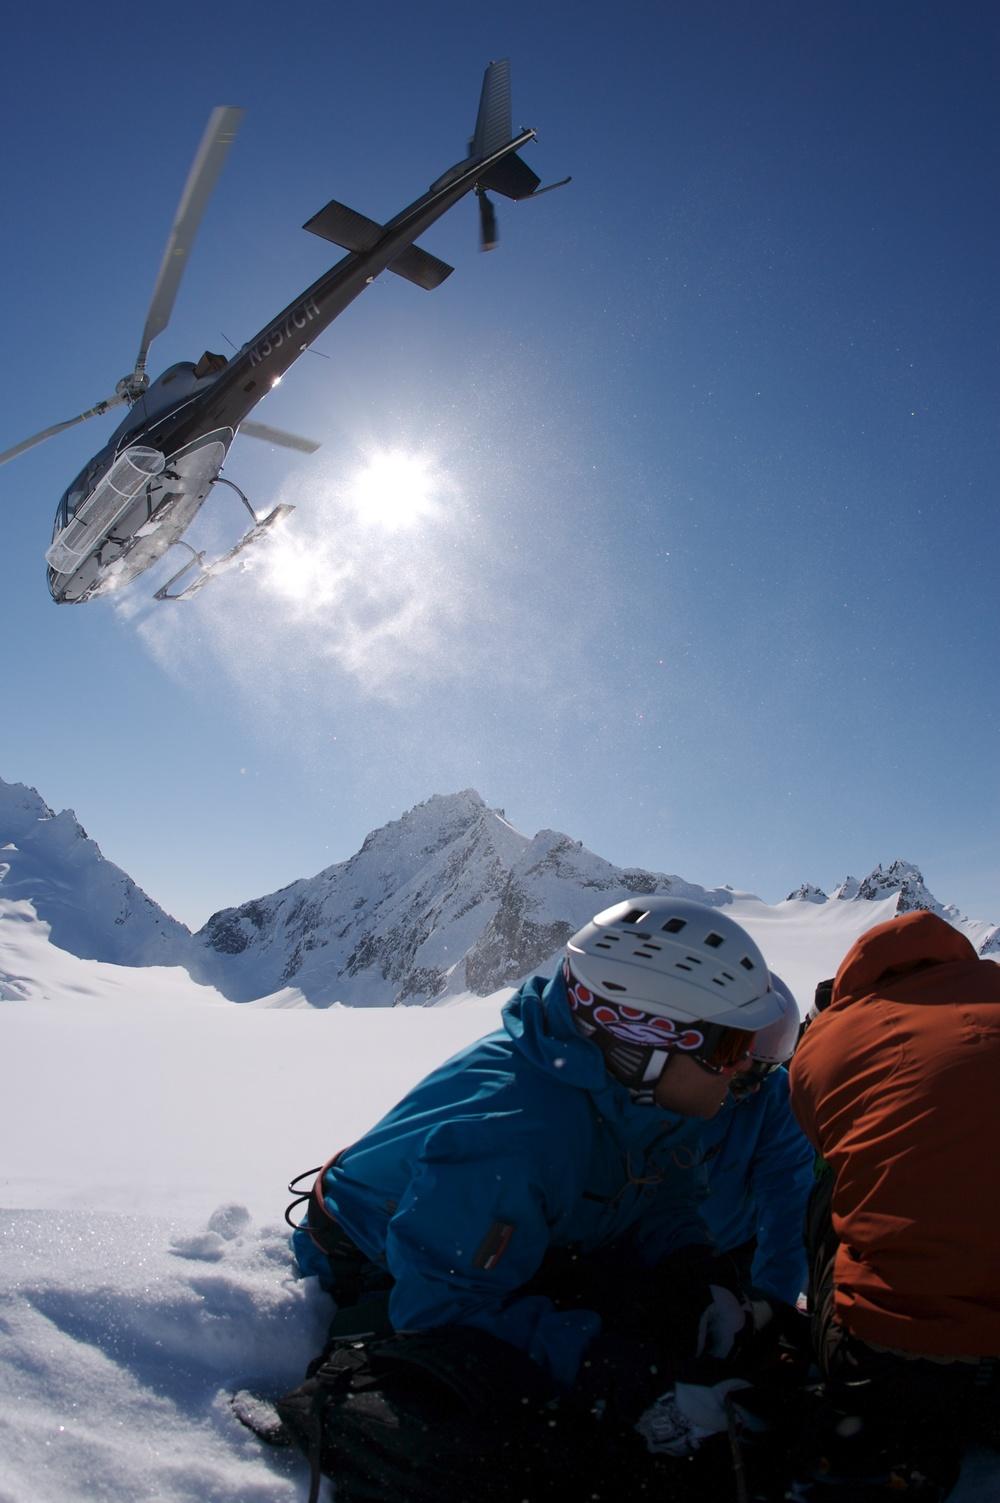 Haines Heli Skiing (11).jpg